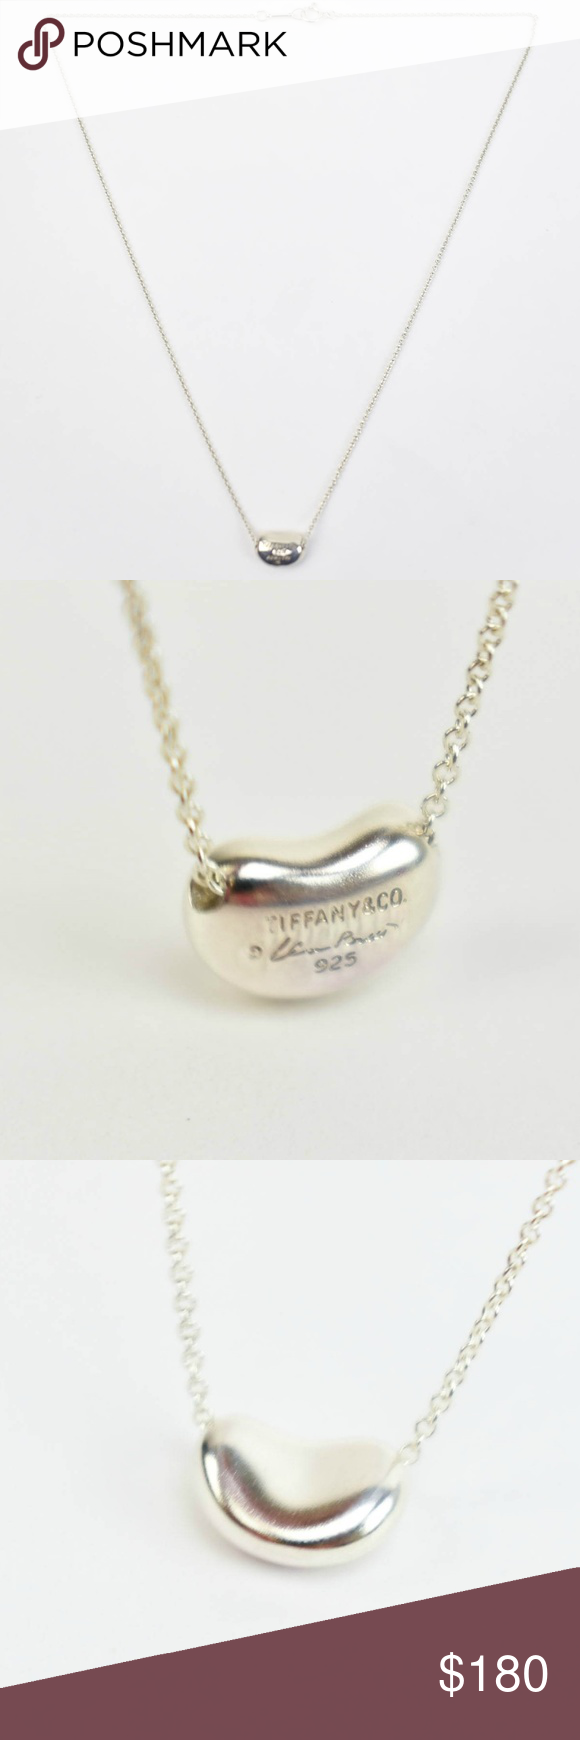 4b40f4269 TIFFANY & CO Sterling Silver Mini Bean Necklace my TIFFANY & CO